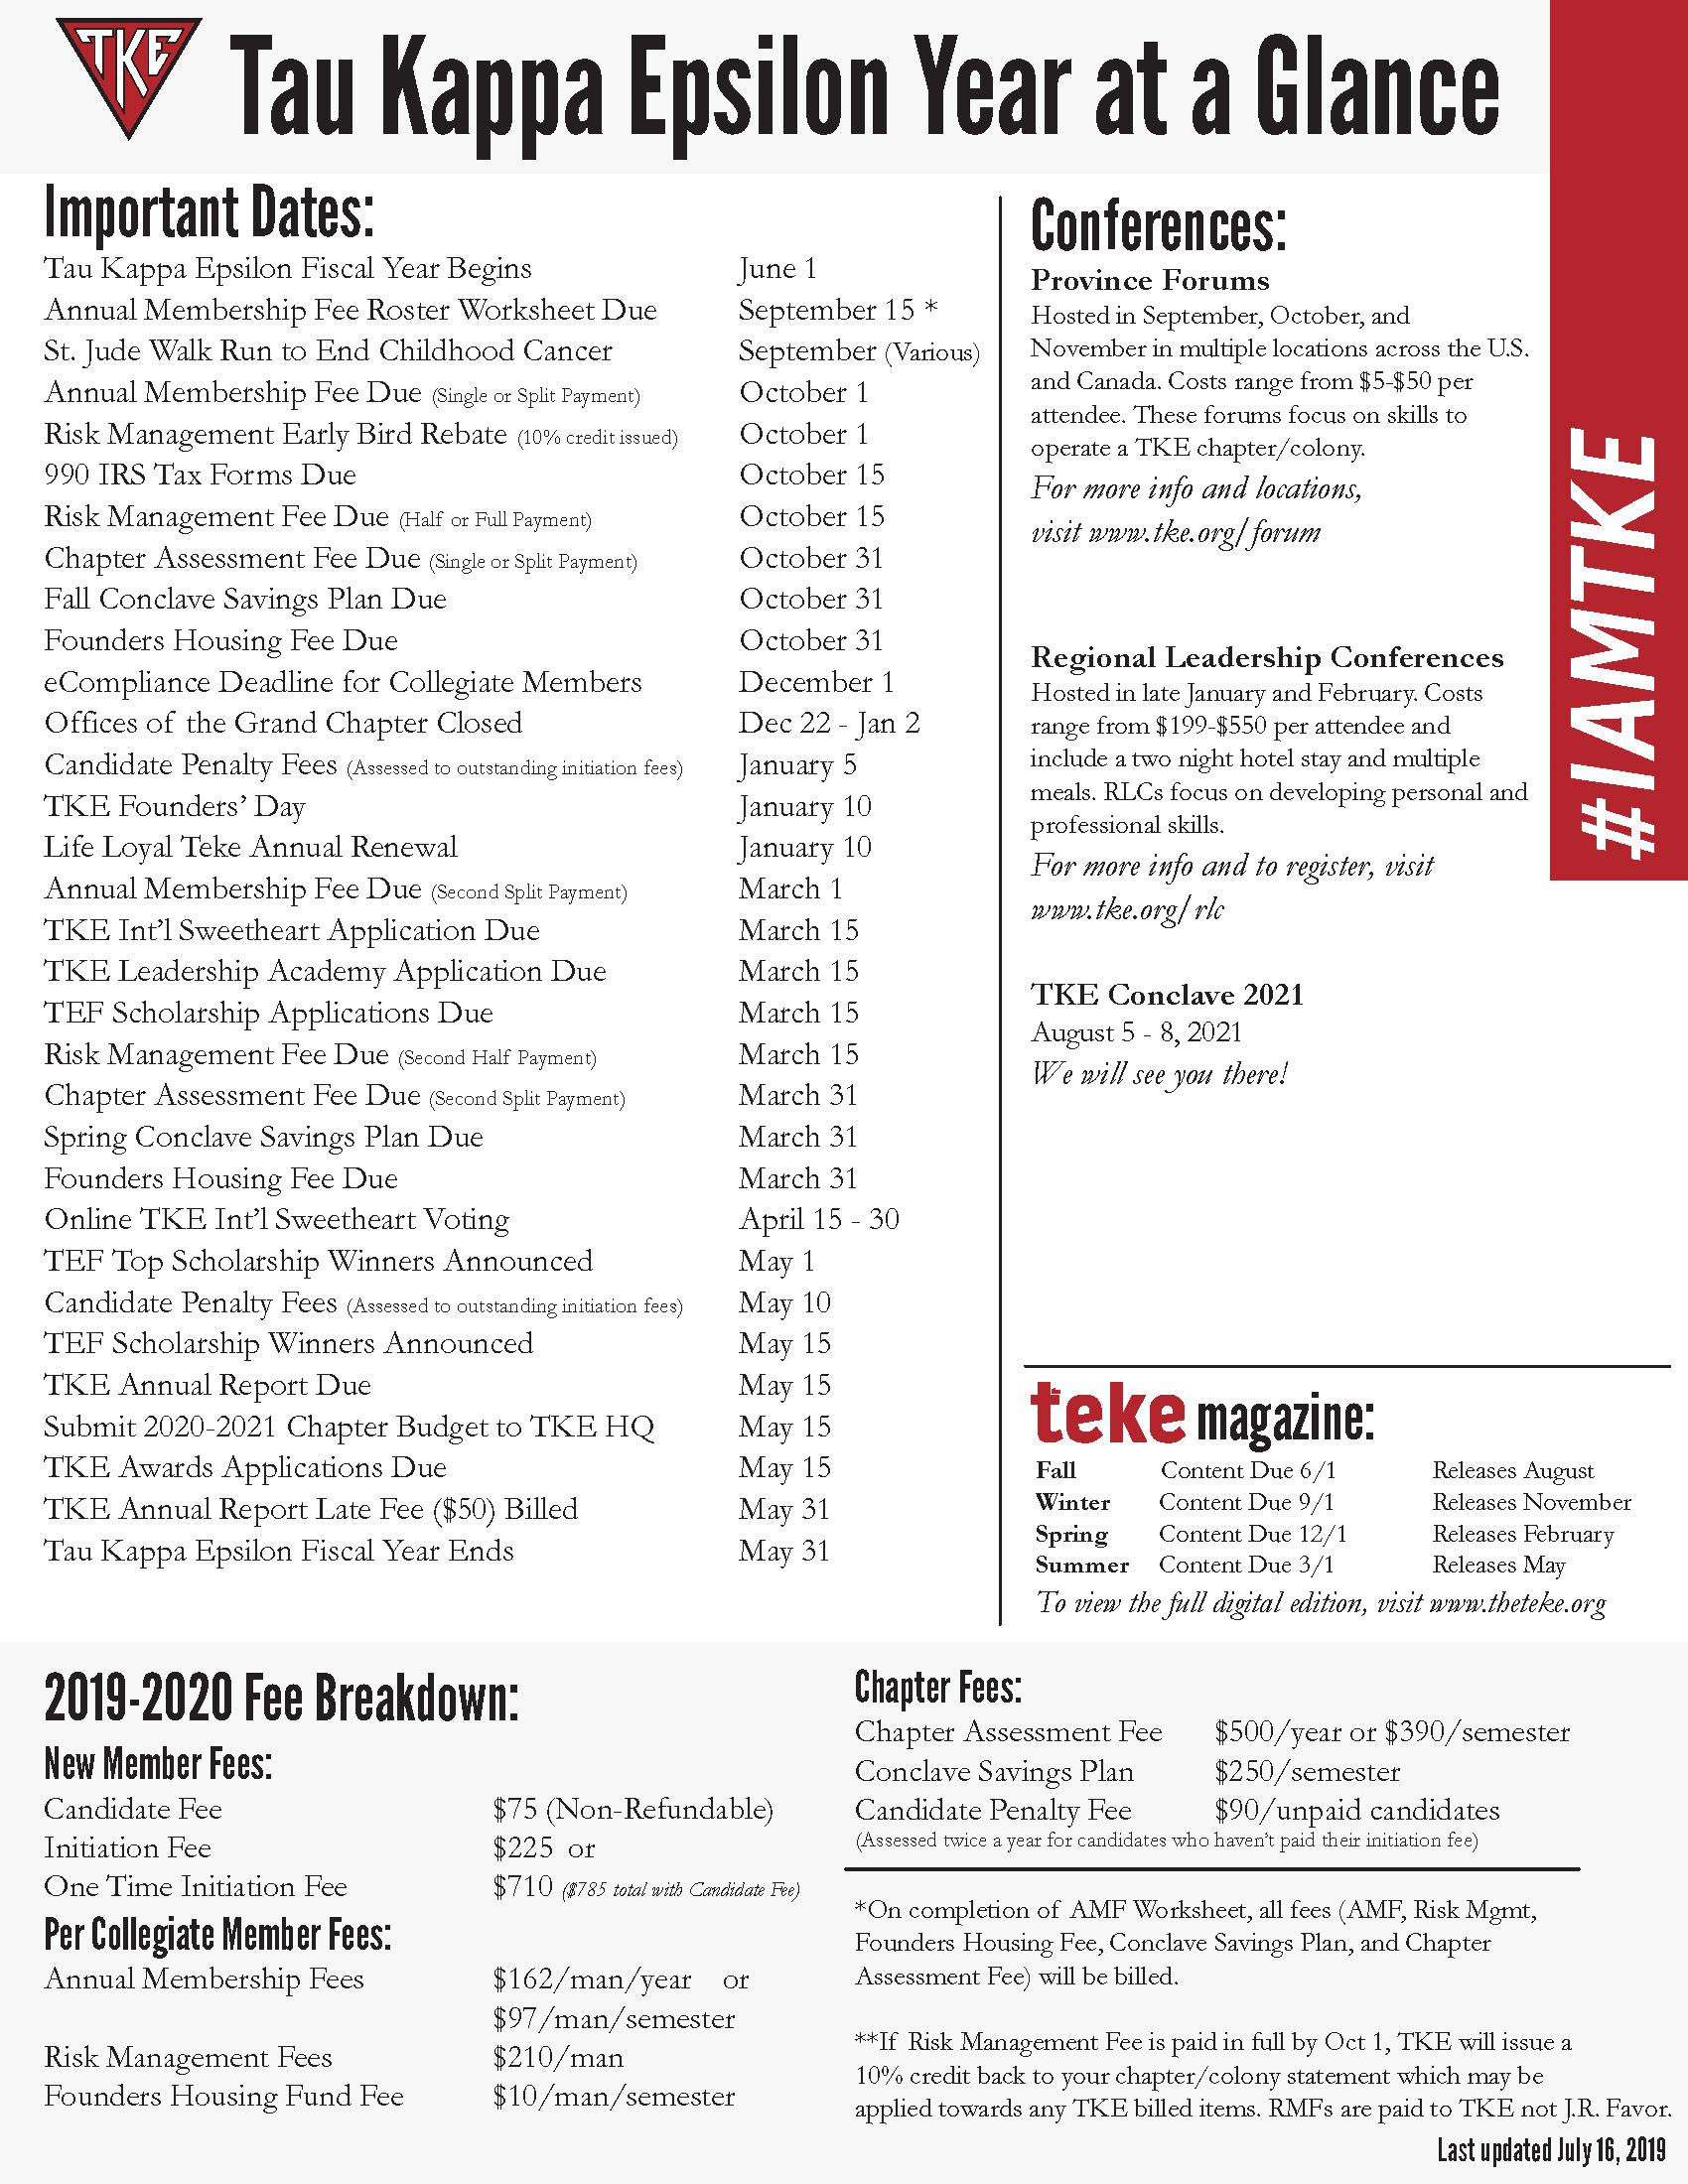 2019-2020 Year At A Glance Calendar | Tke regarding U Of R 2020 Calendar